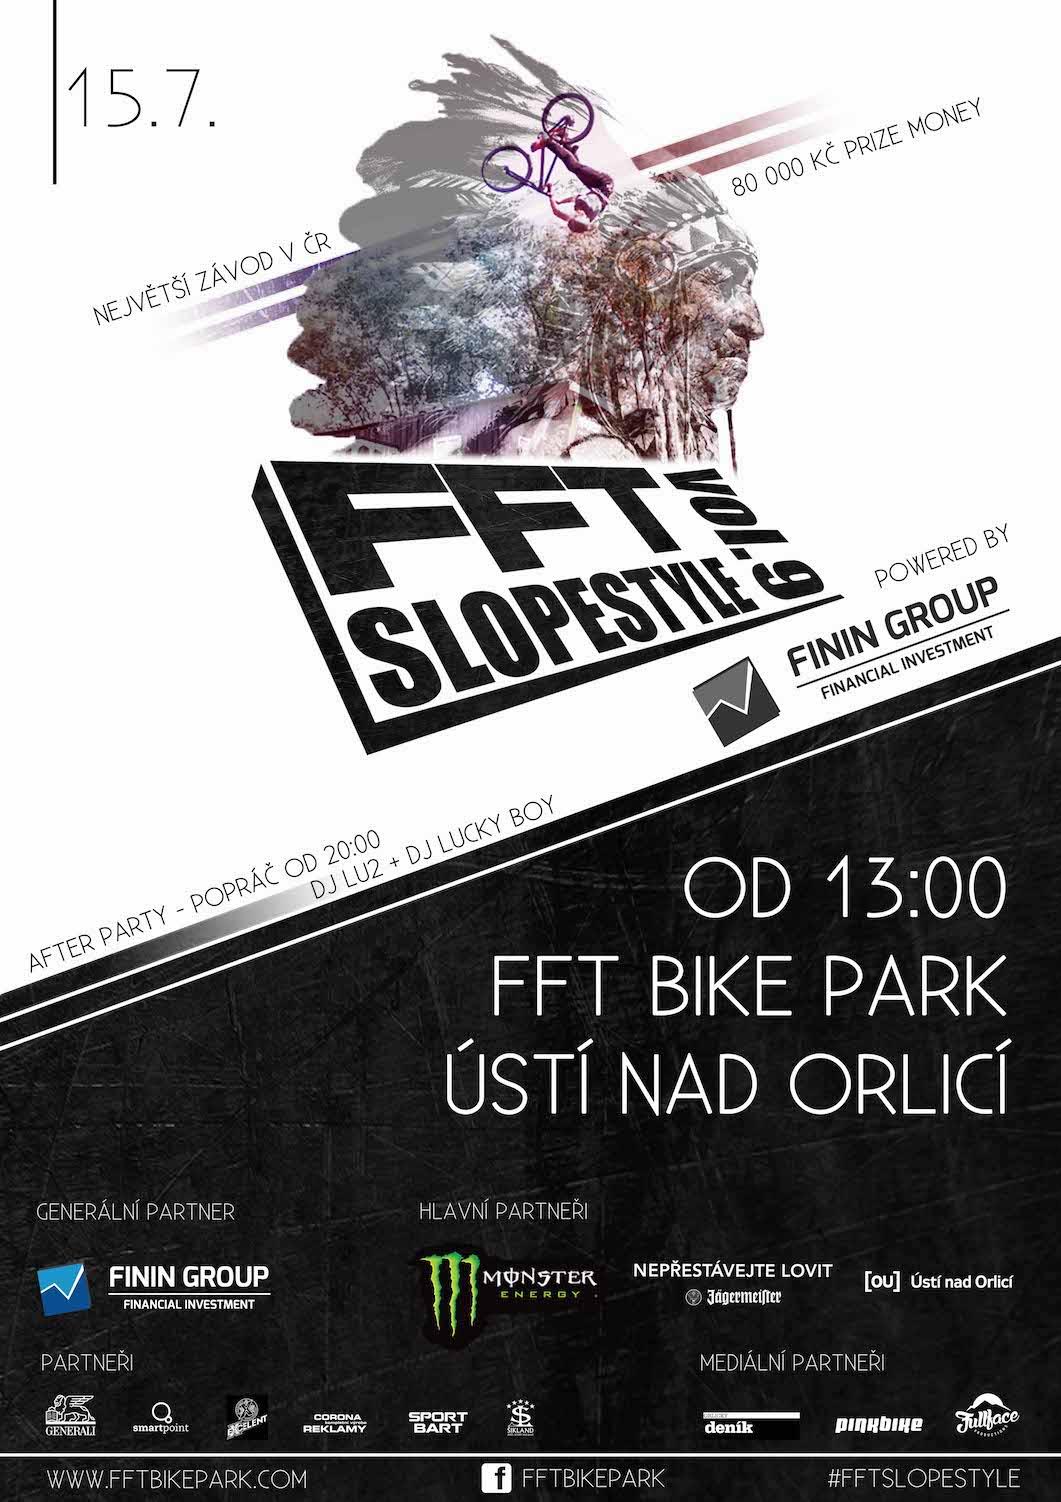 FFT Slopestyle 2017 - plakat